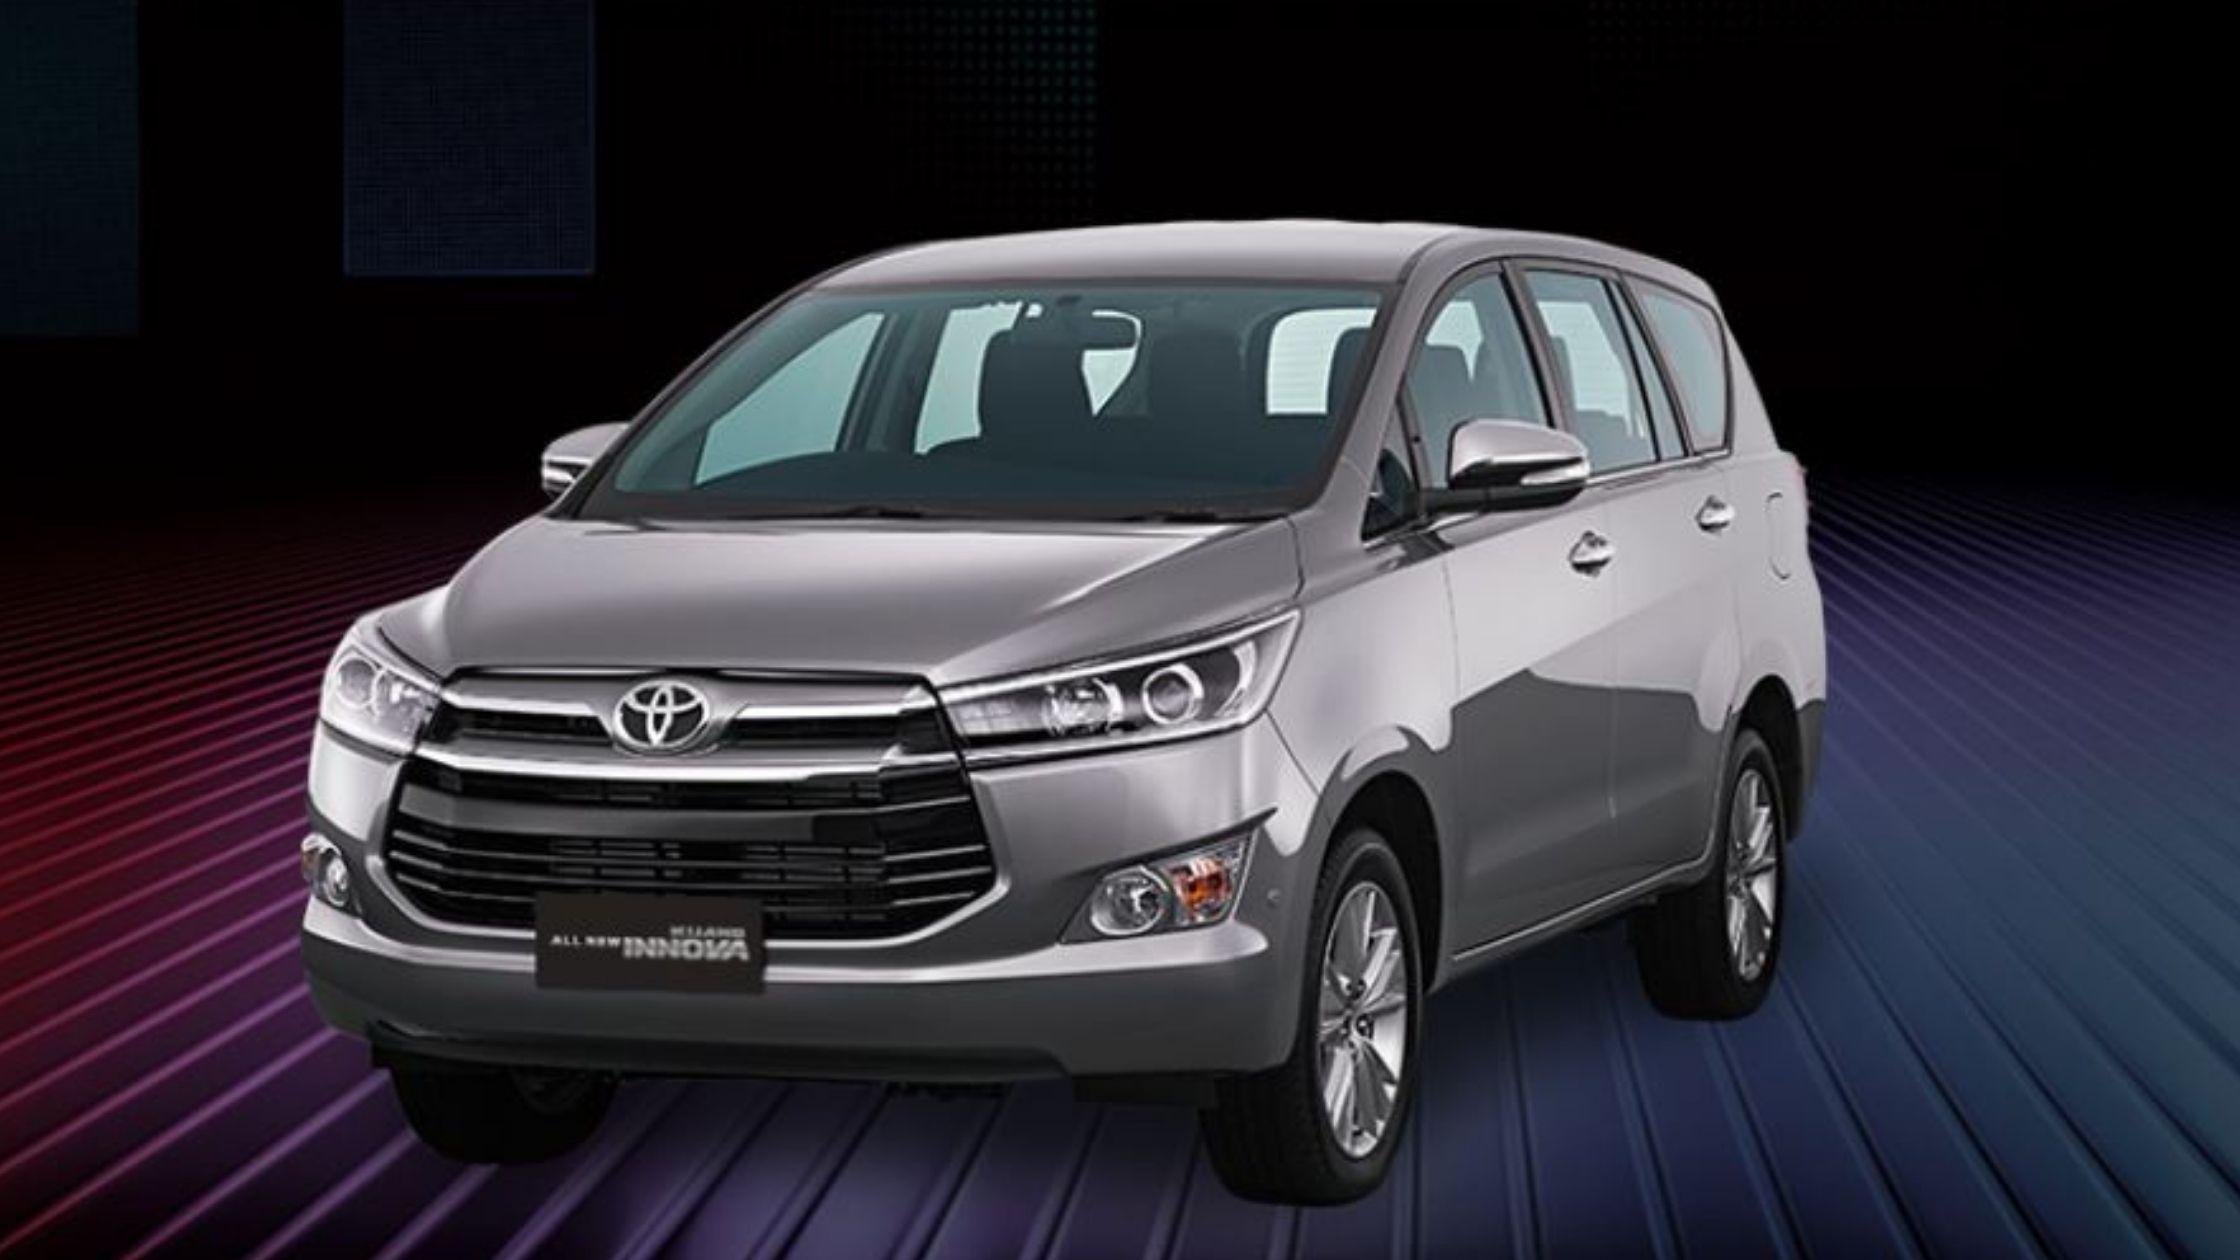 Tampilan Toyota Kijang Innova New Series 2020